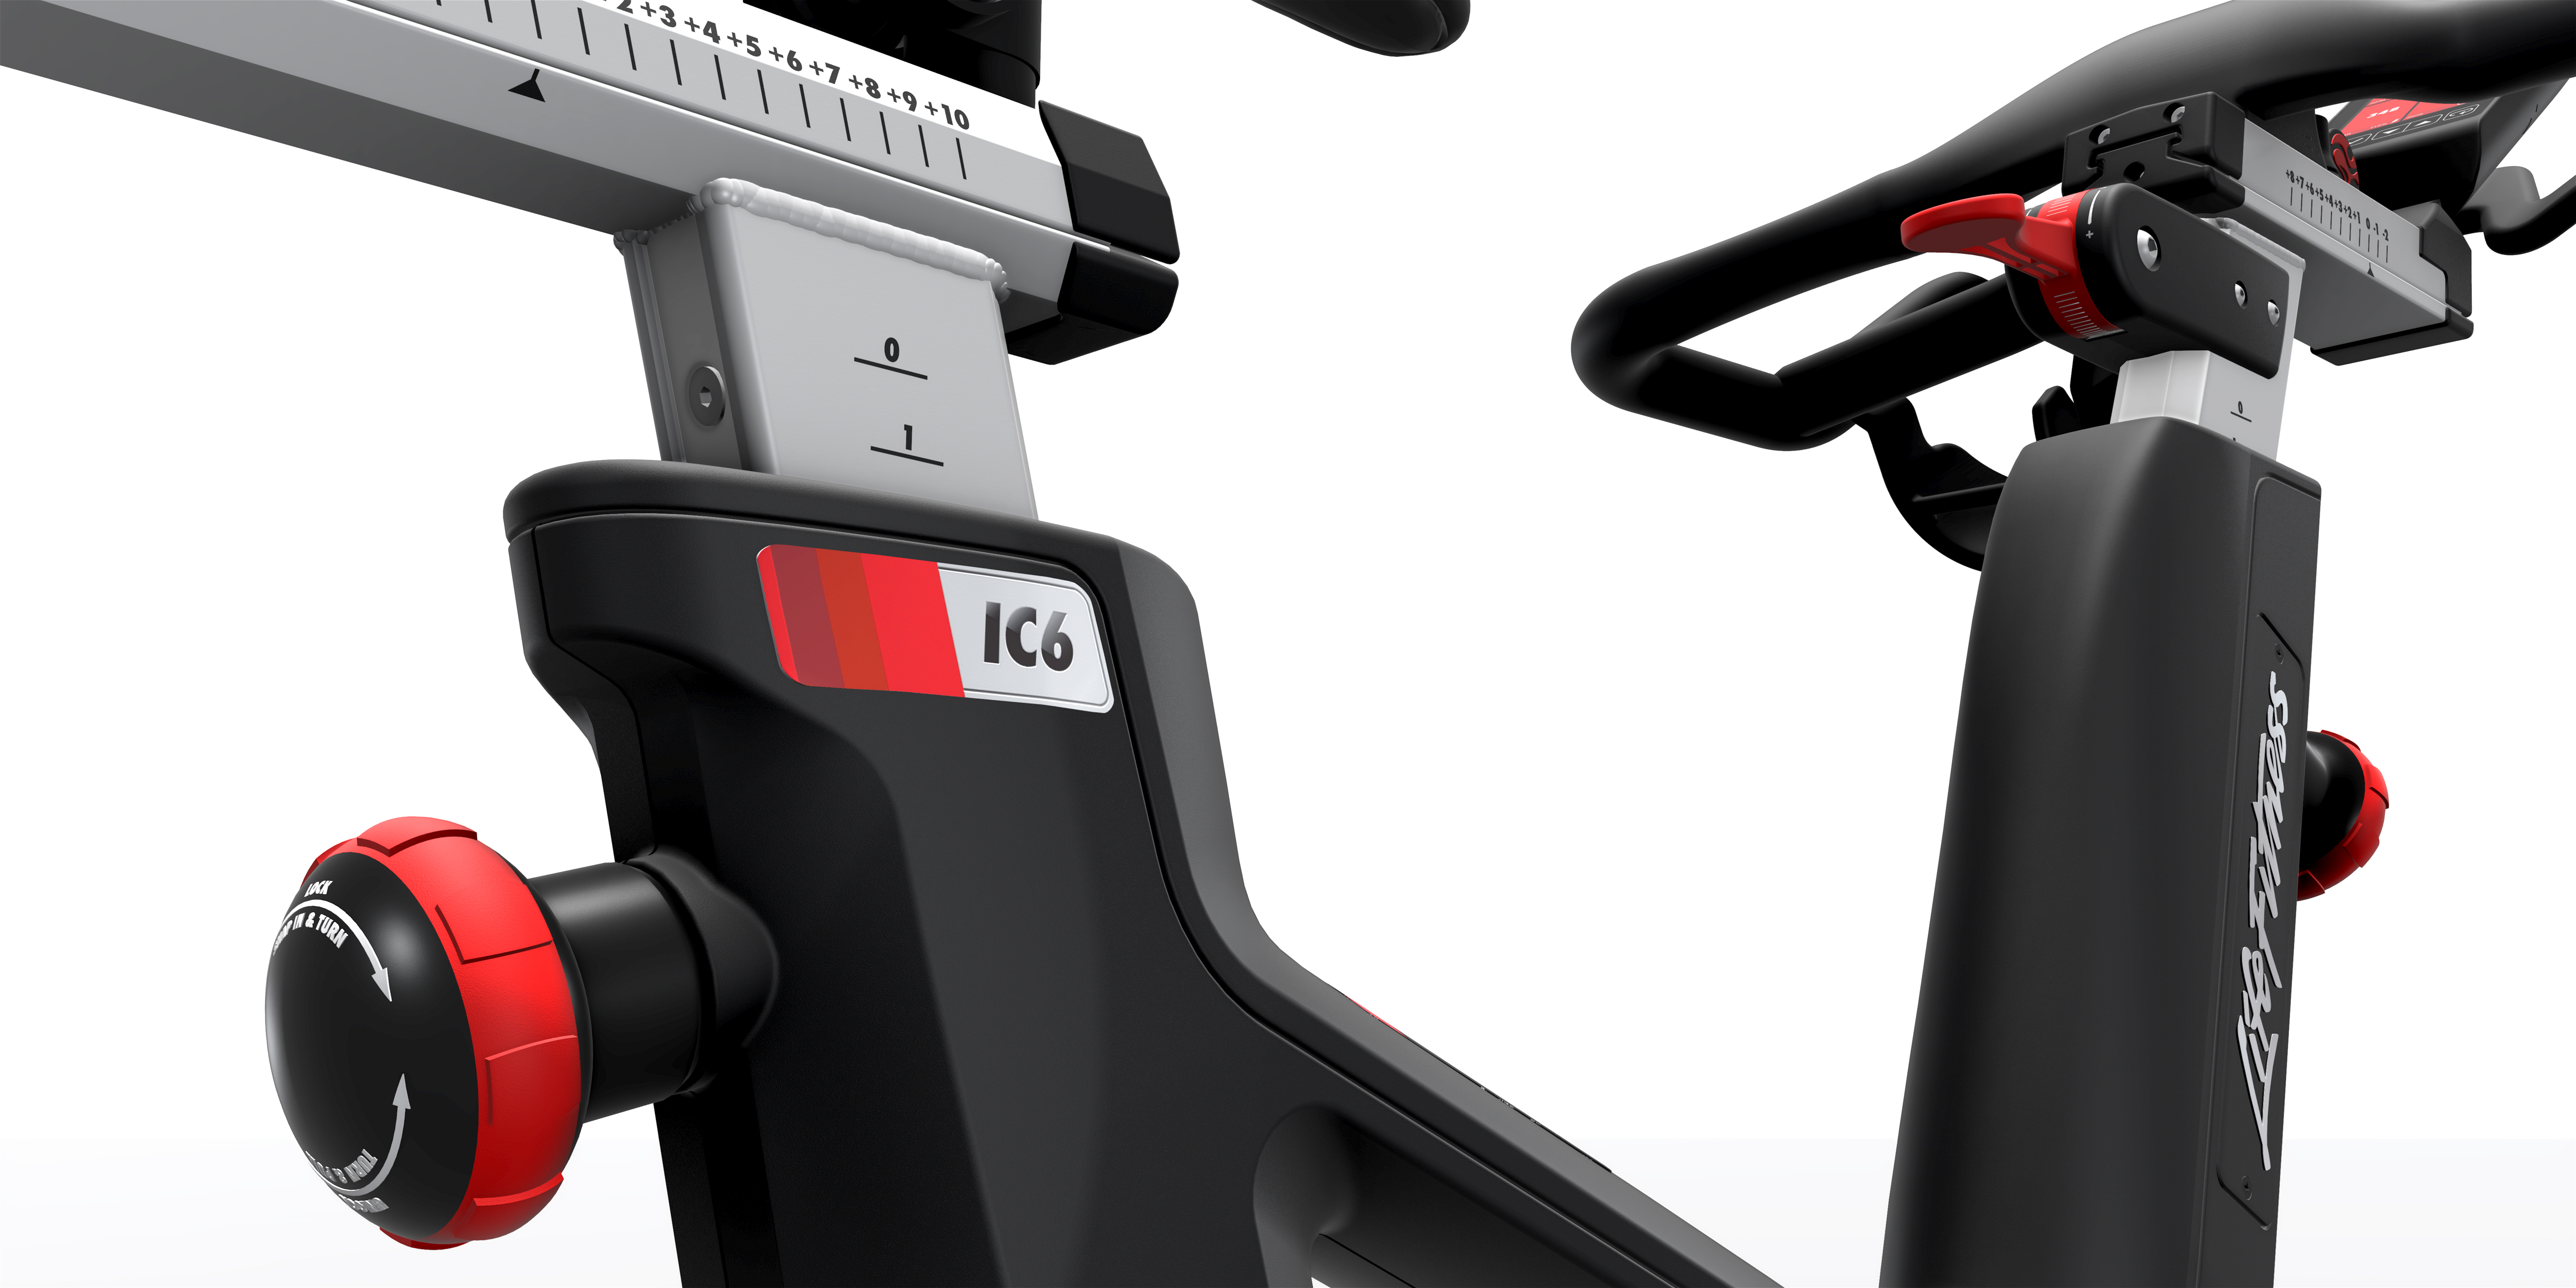 ICG-IndoorCycle-2017-IC6-00012